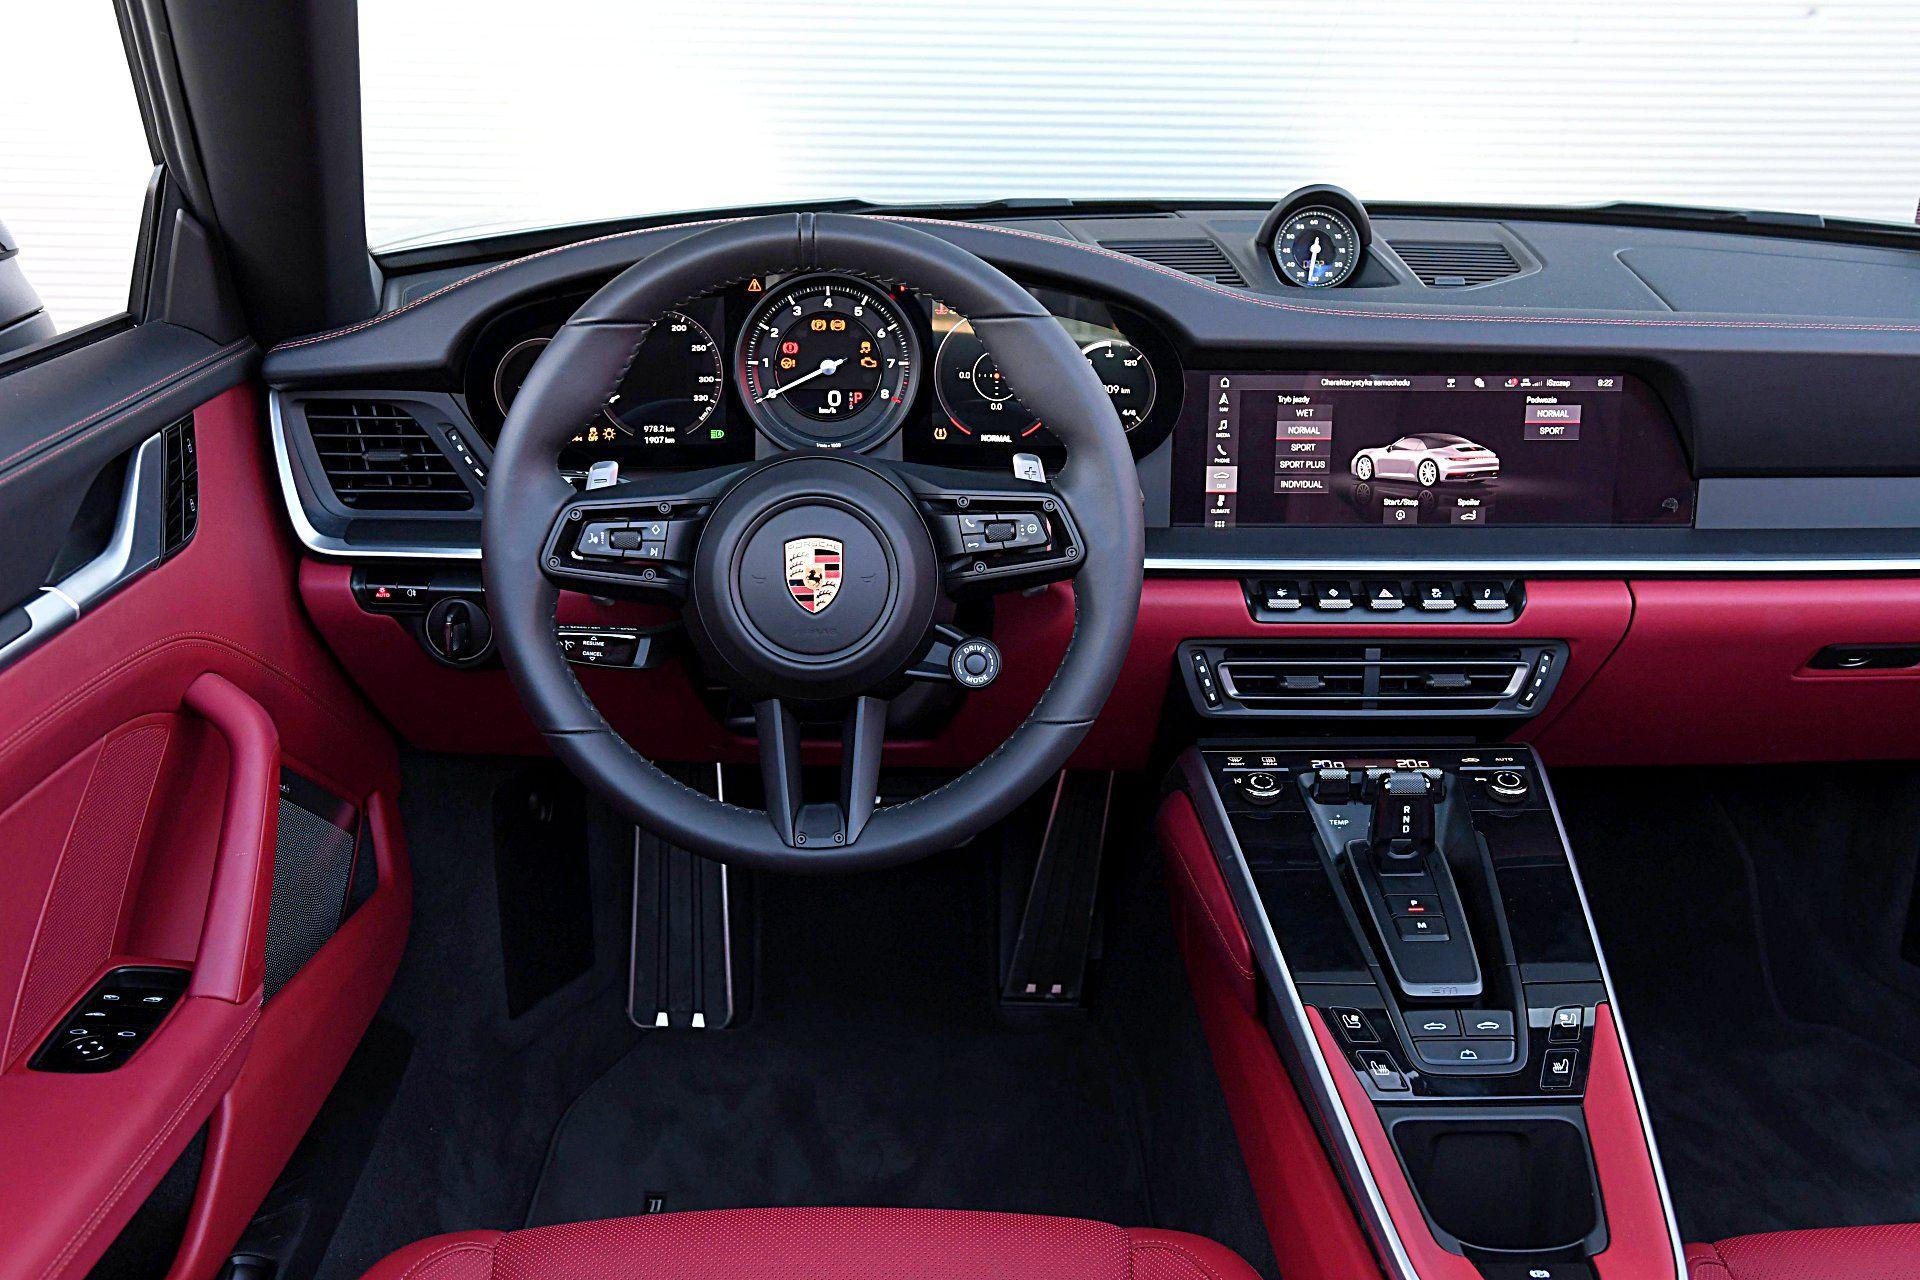 PORSCHE 911 992 Carrera 4S Cabriolet 3.0T deska rozdzielcza